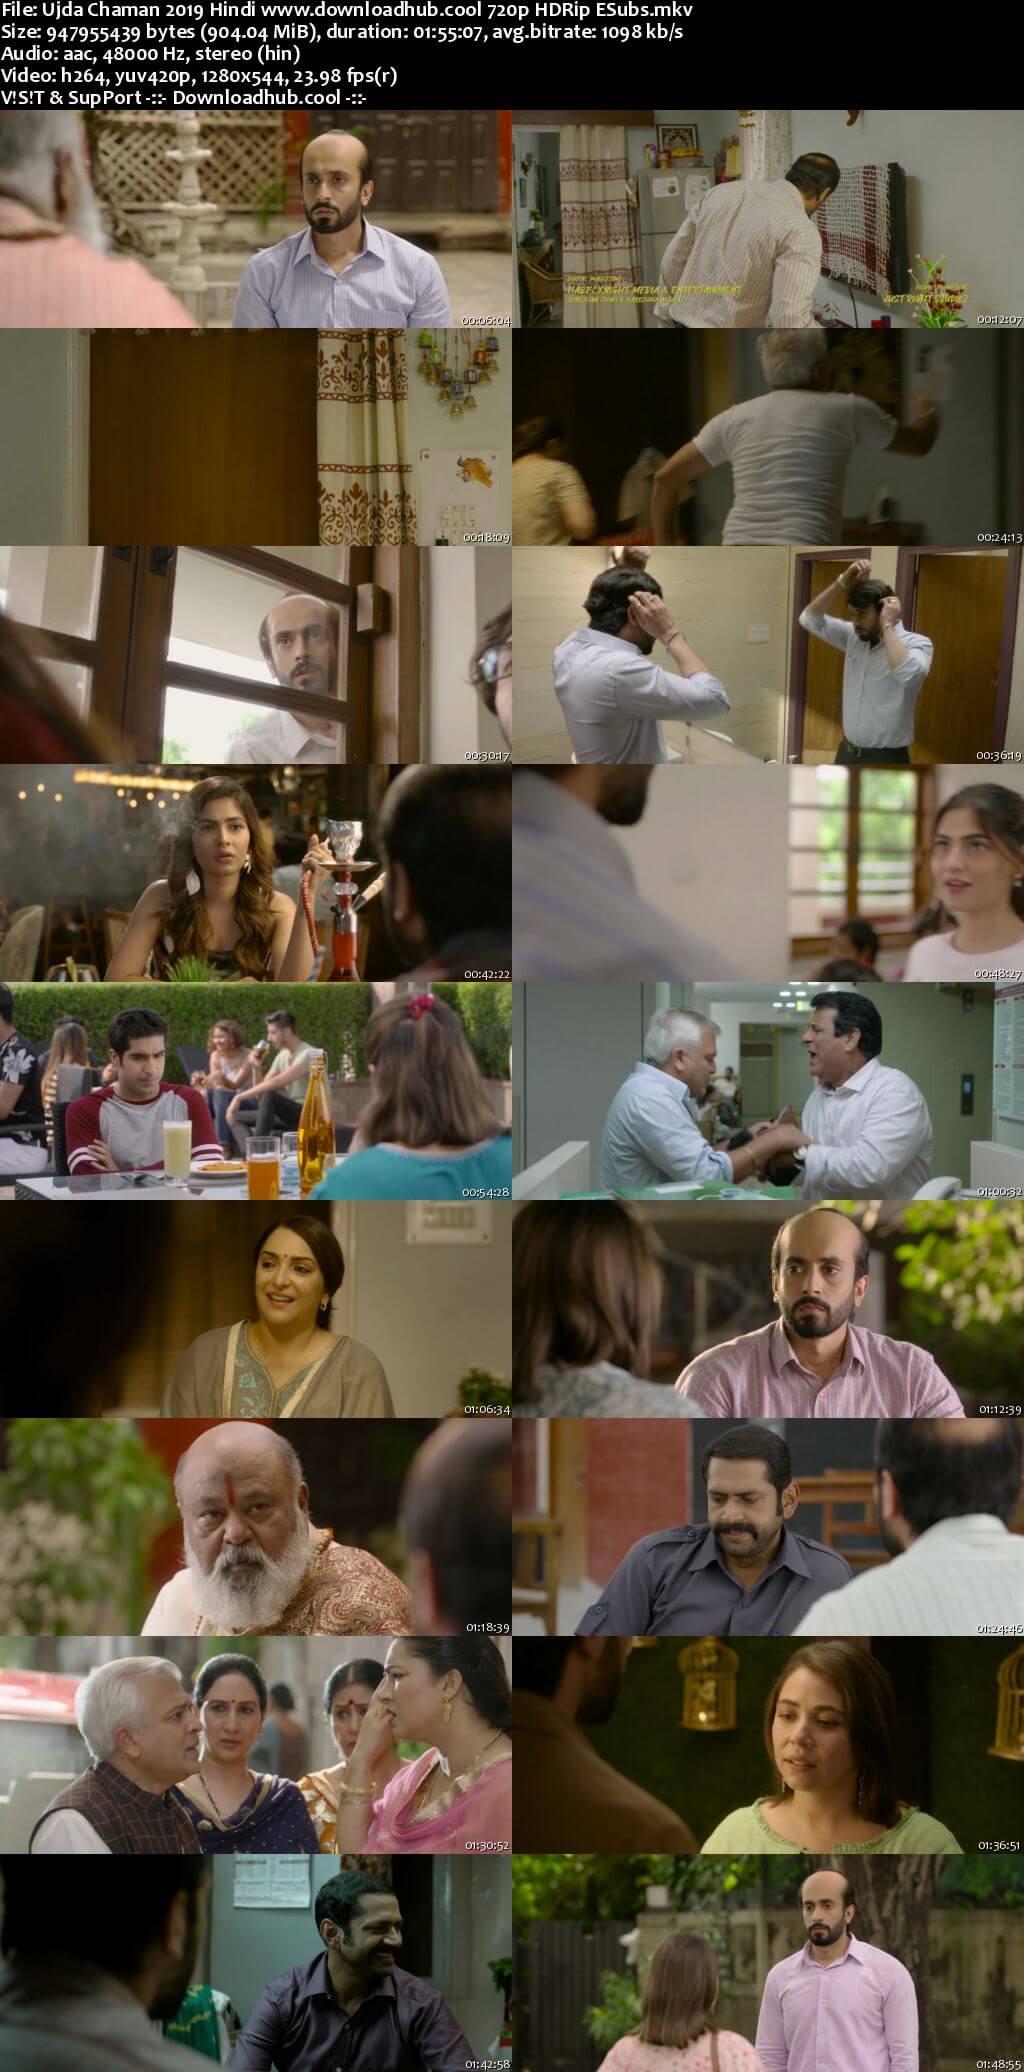 Ujda Chaman 2019 Hindi 720p HDRip ESubs